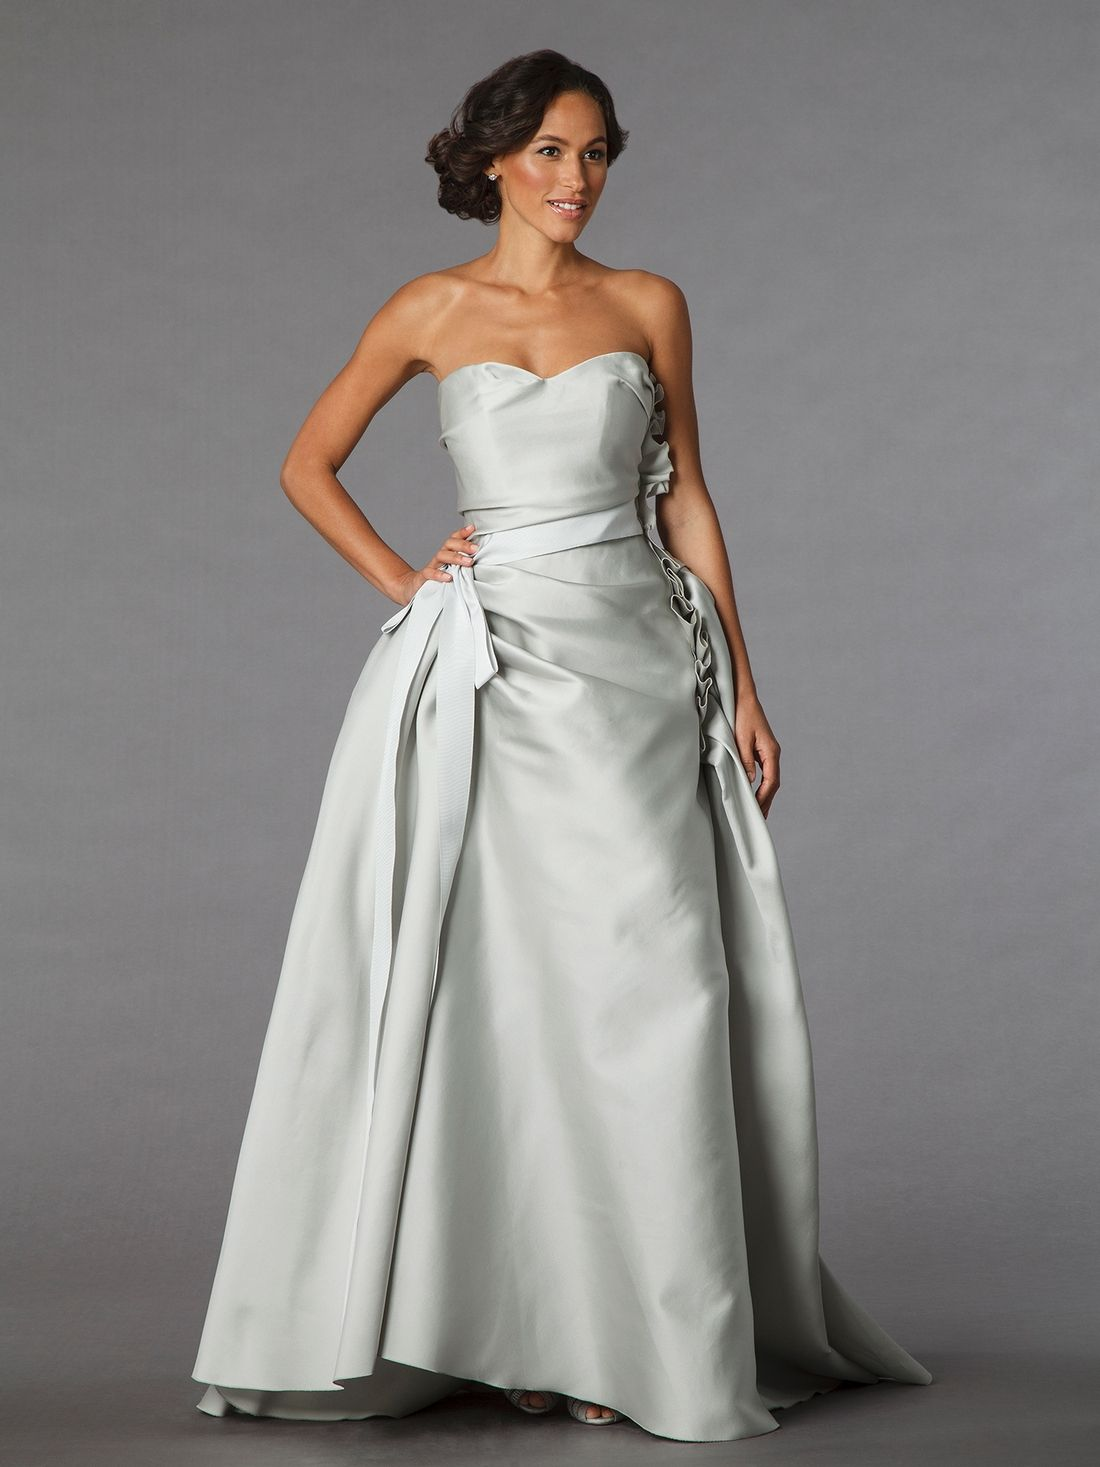 Lanvin Wedding Dresses http://www.myweddingprinter.com/lanvin ...